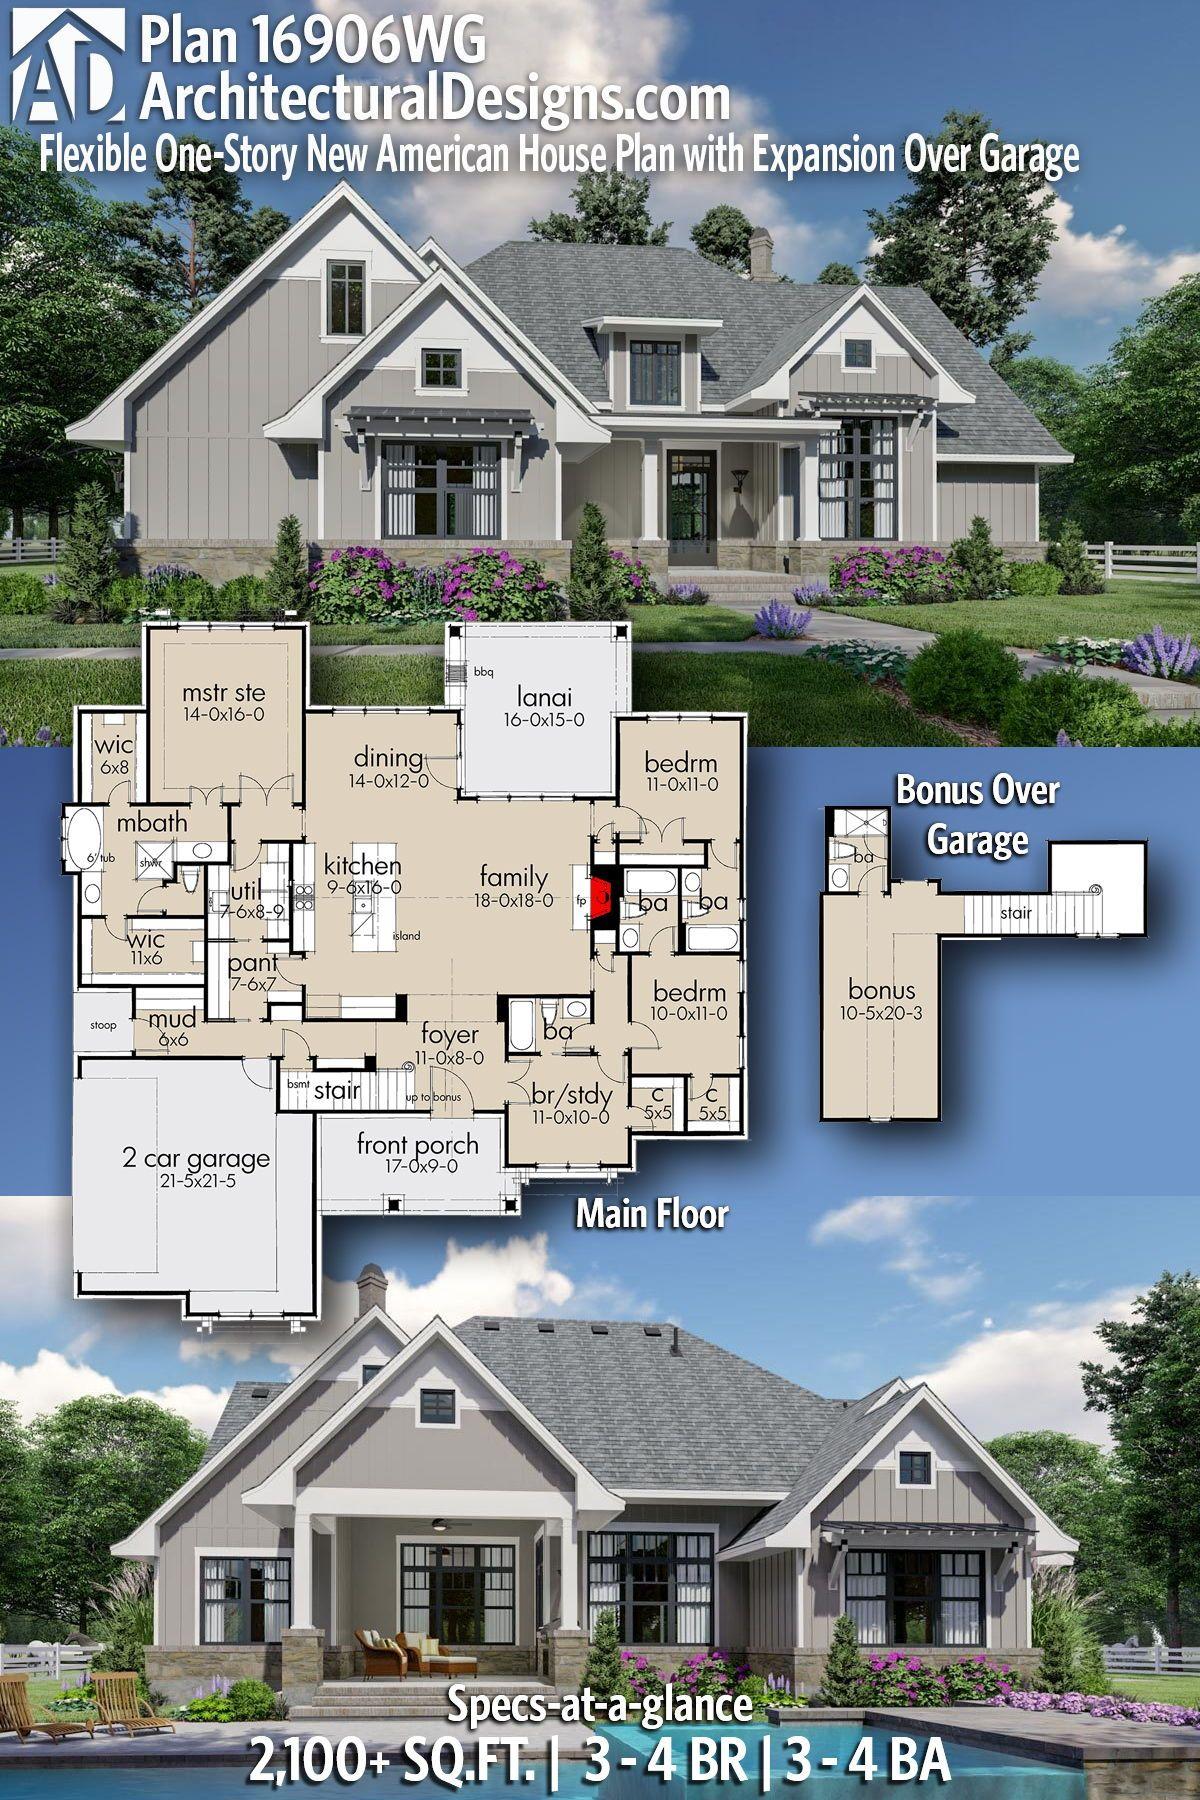 Plan 16906WG: Flexible One-Story New American House Plan ...